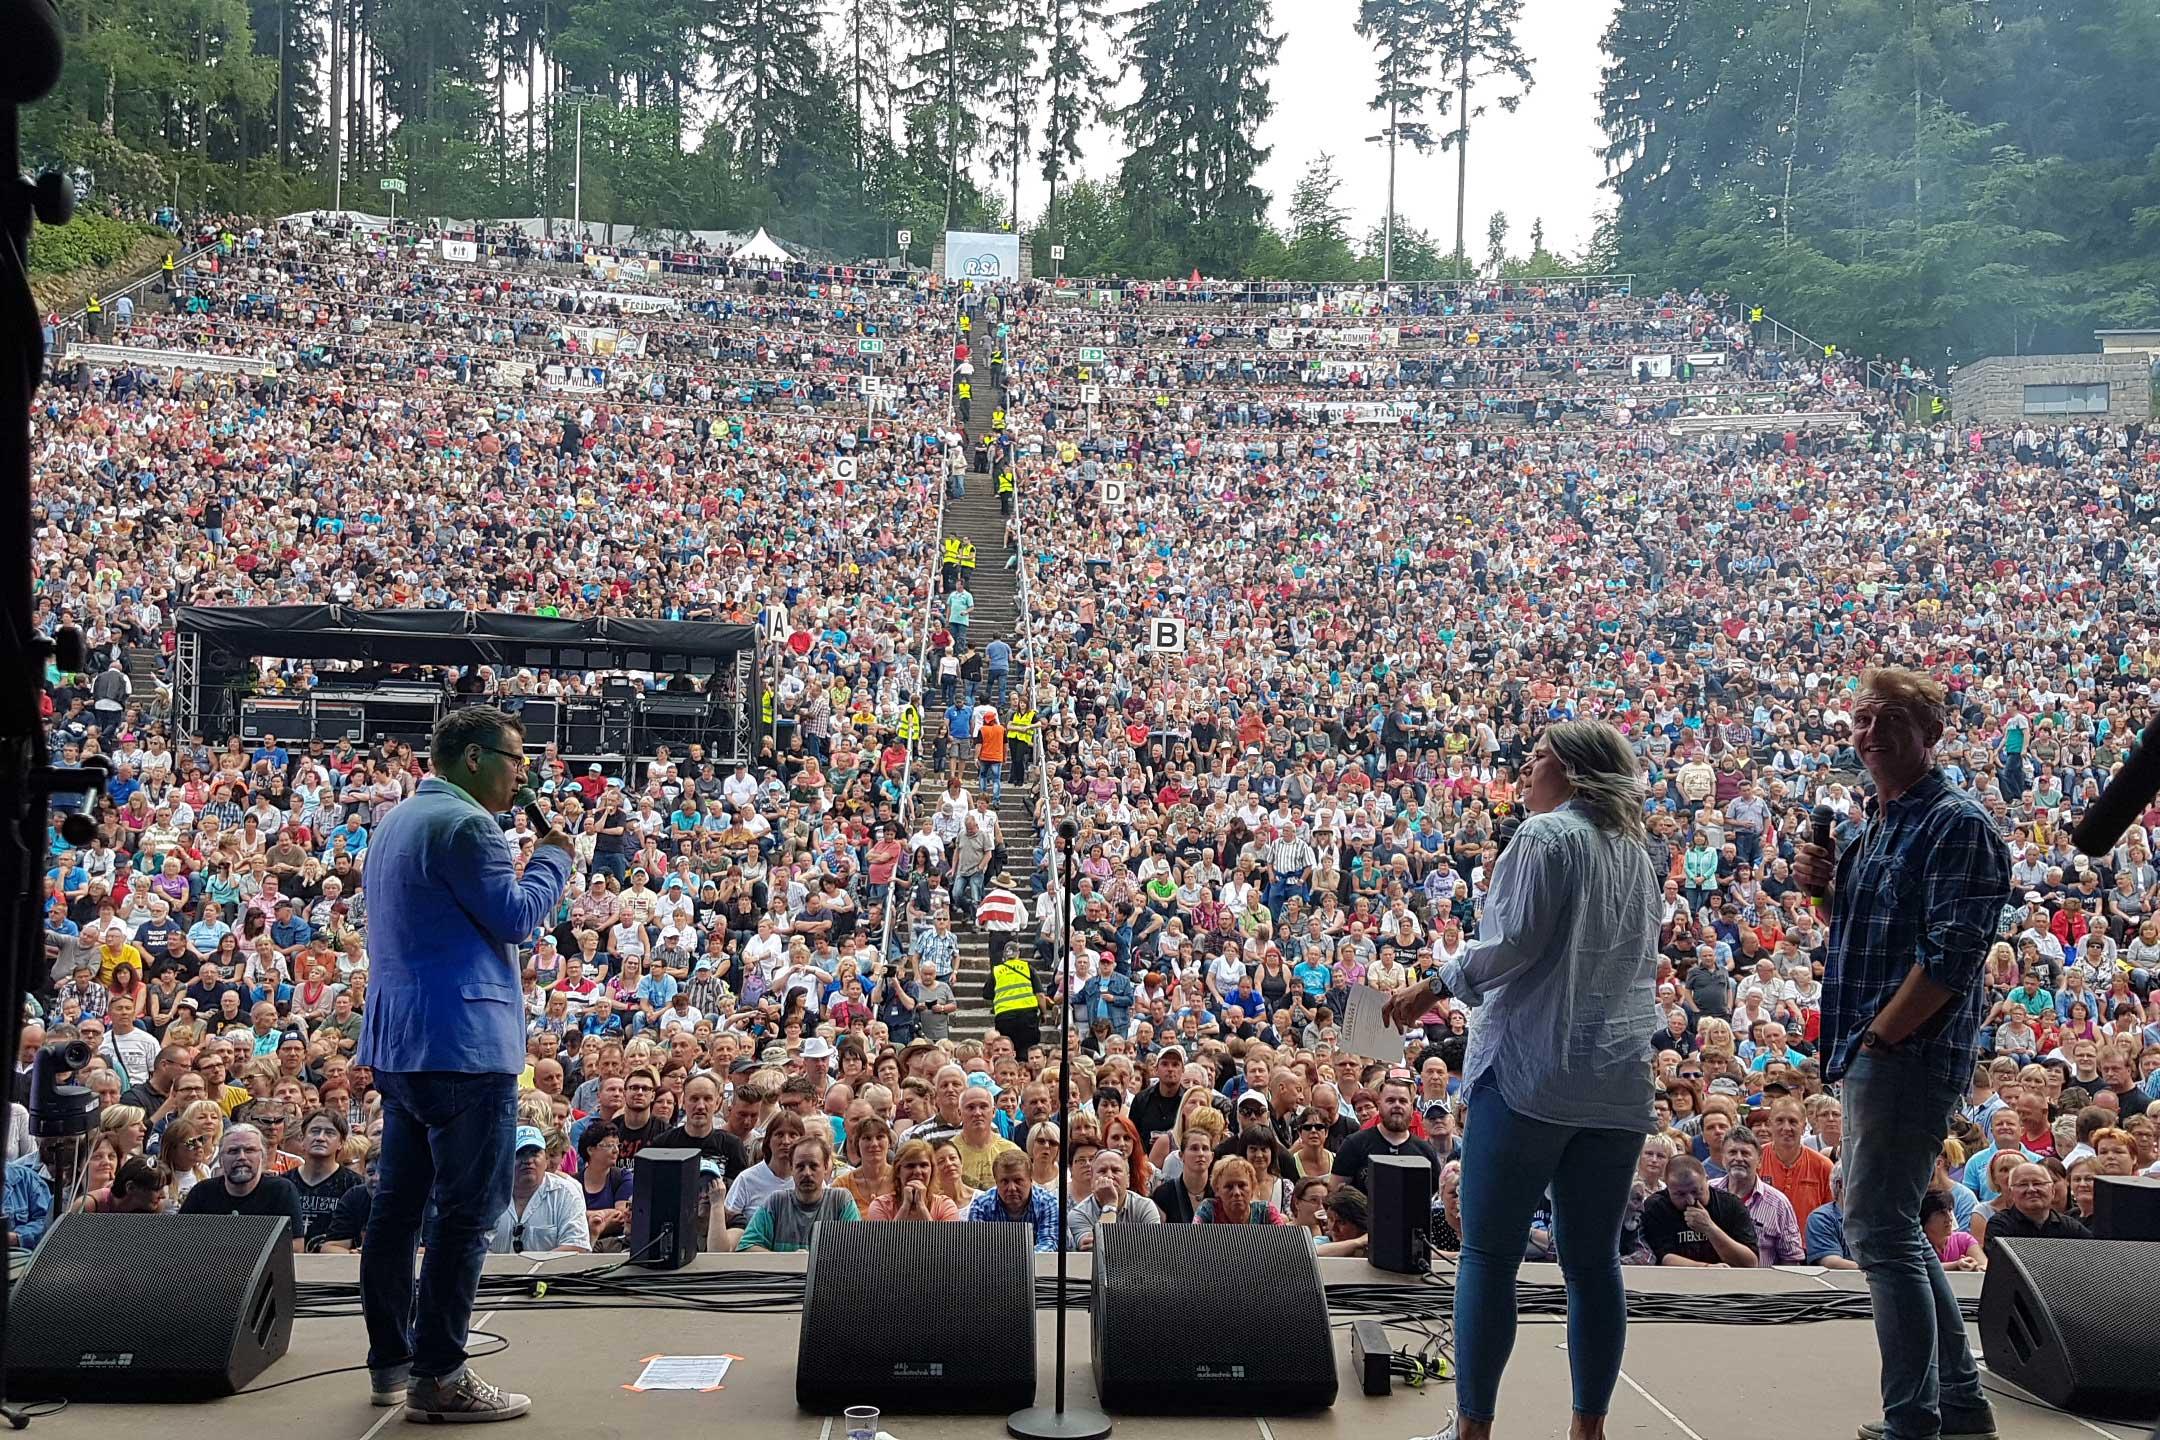 RSA Festival 2017